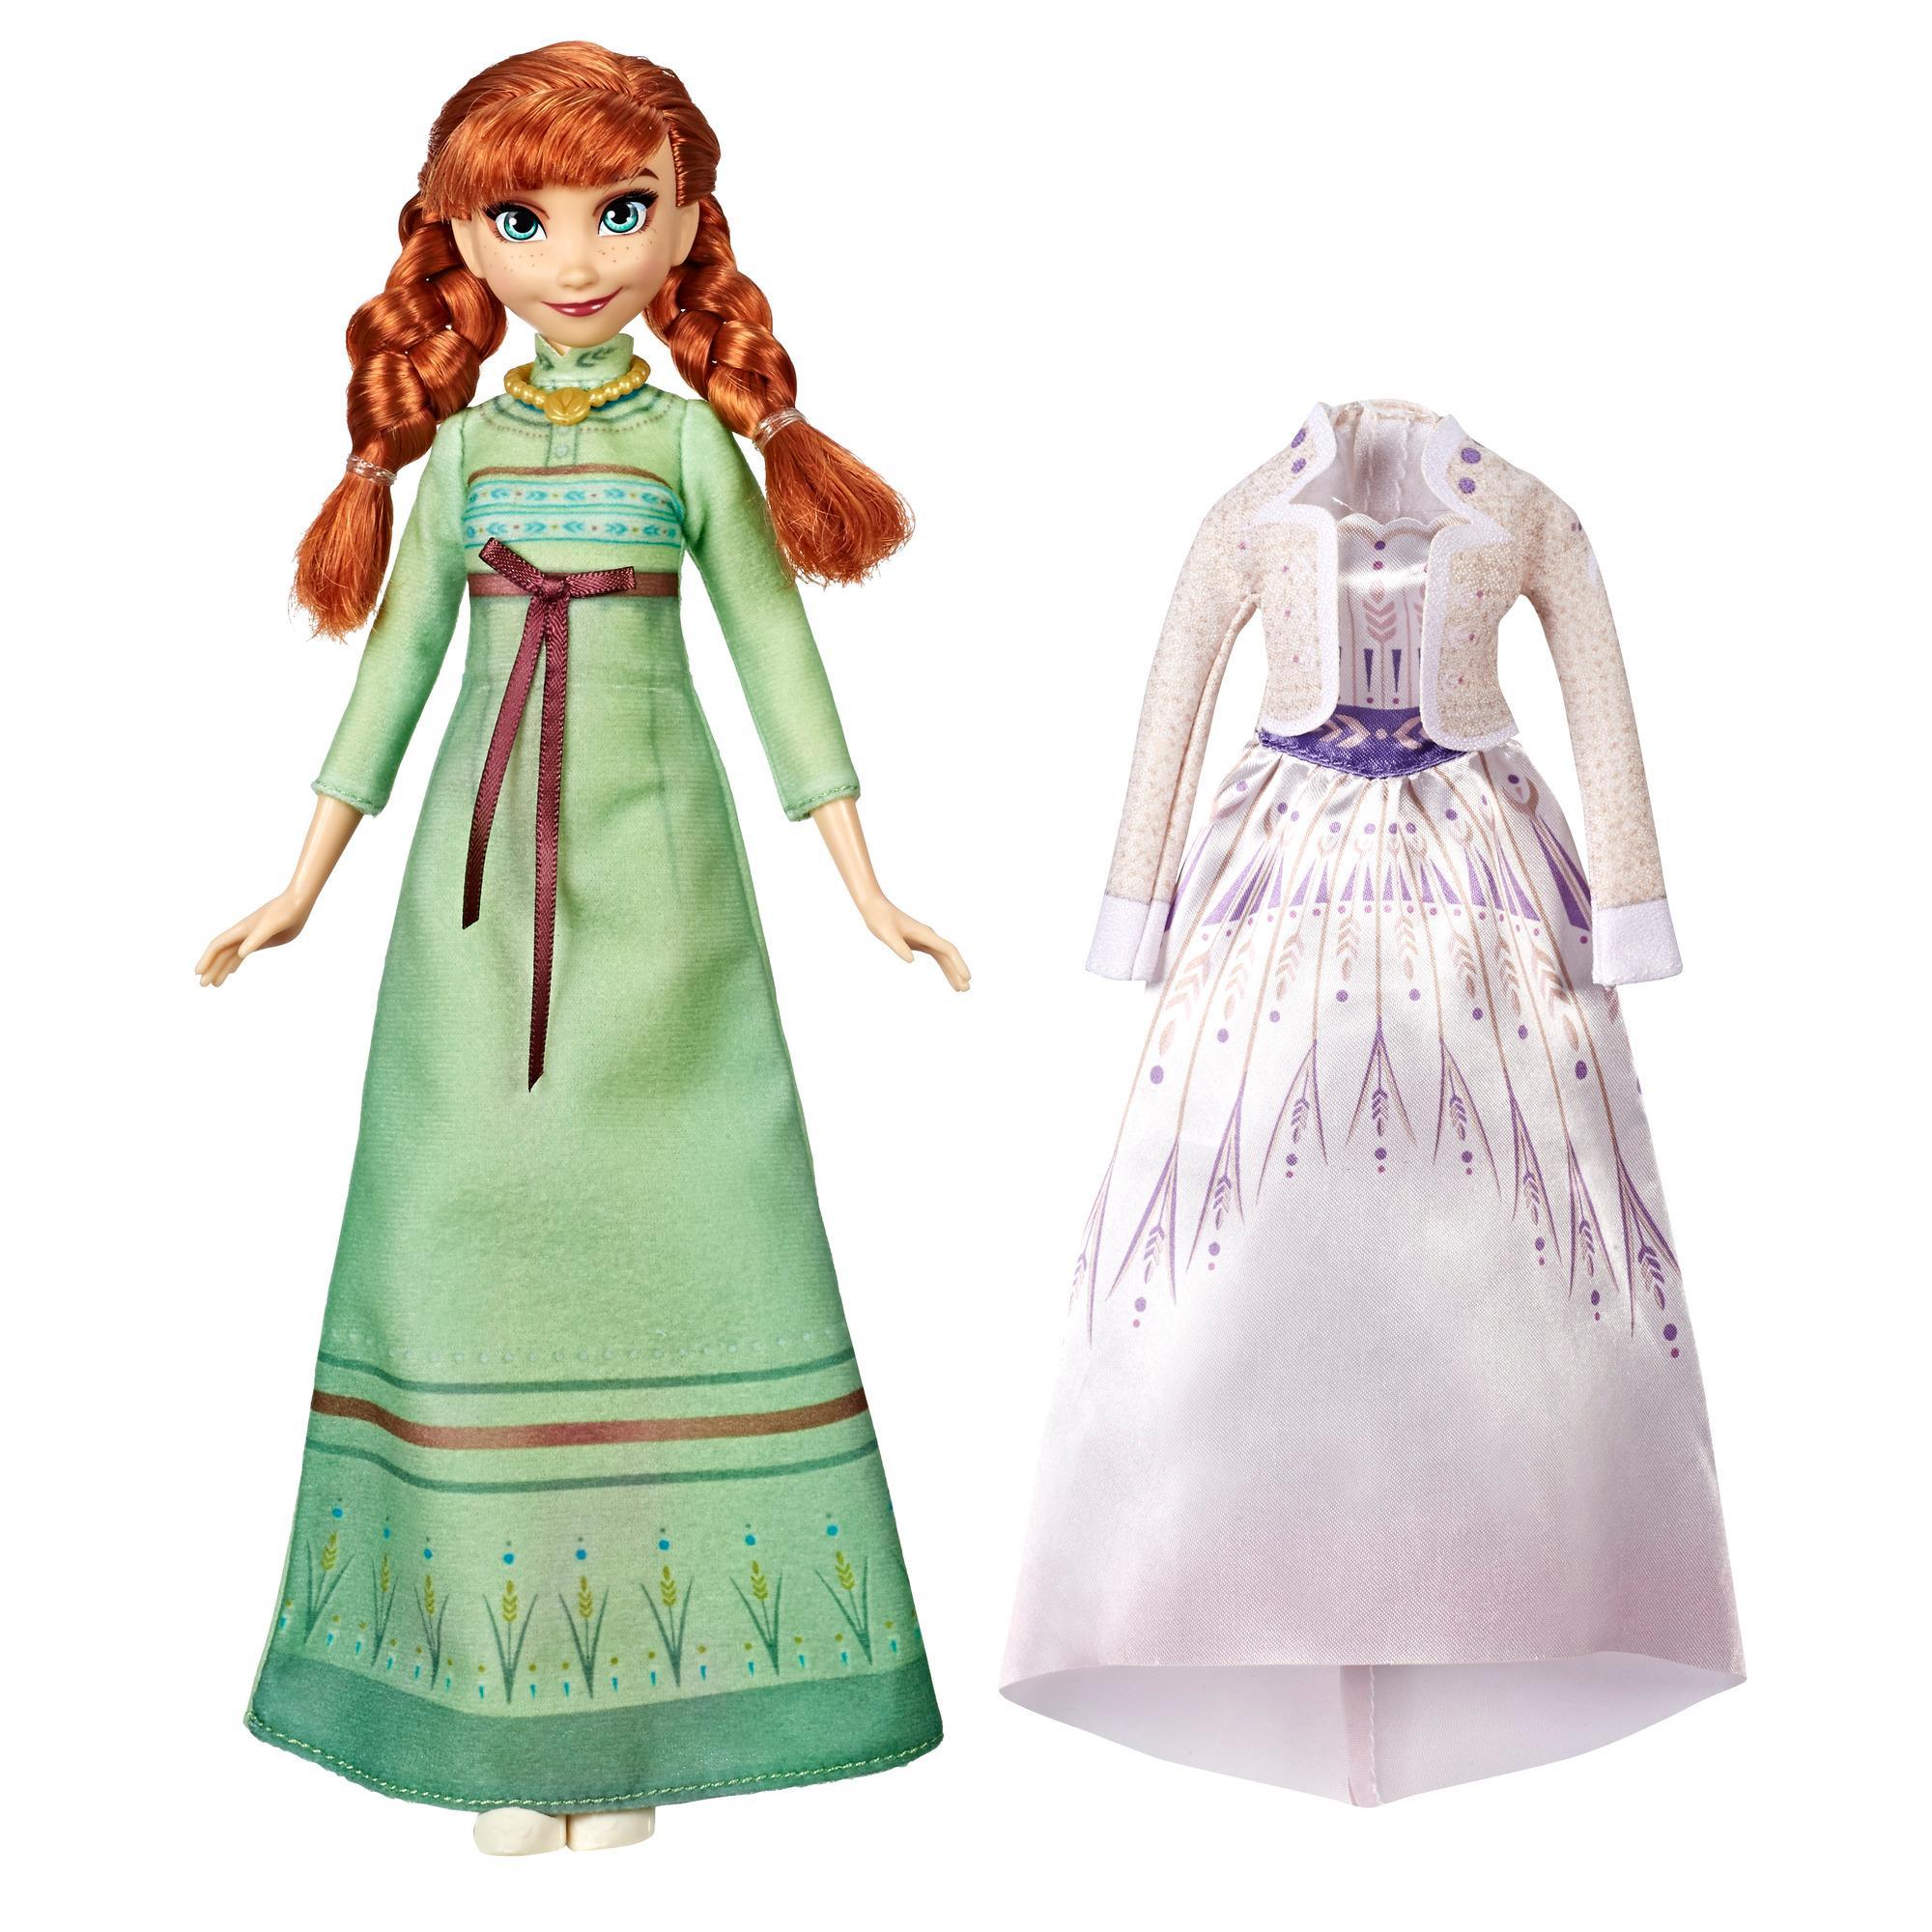 Frozen 2 Papusa Anna cu costumatie de dormit